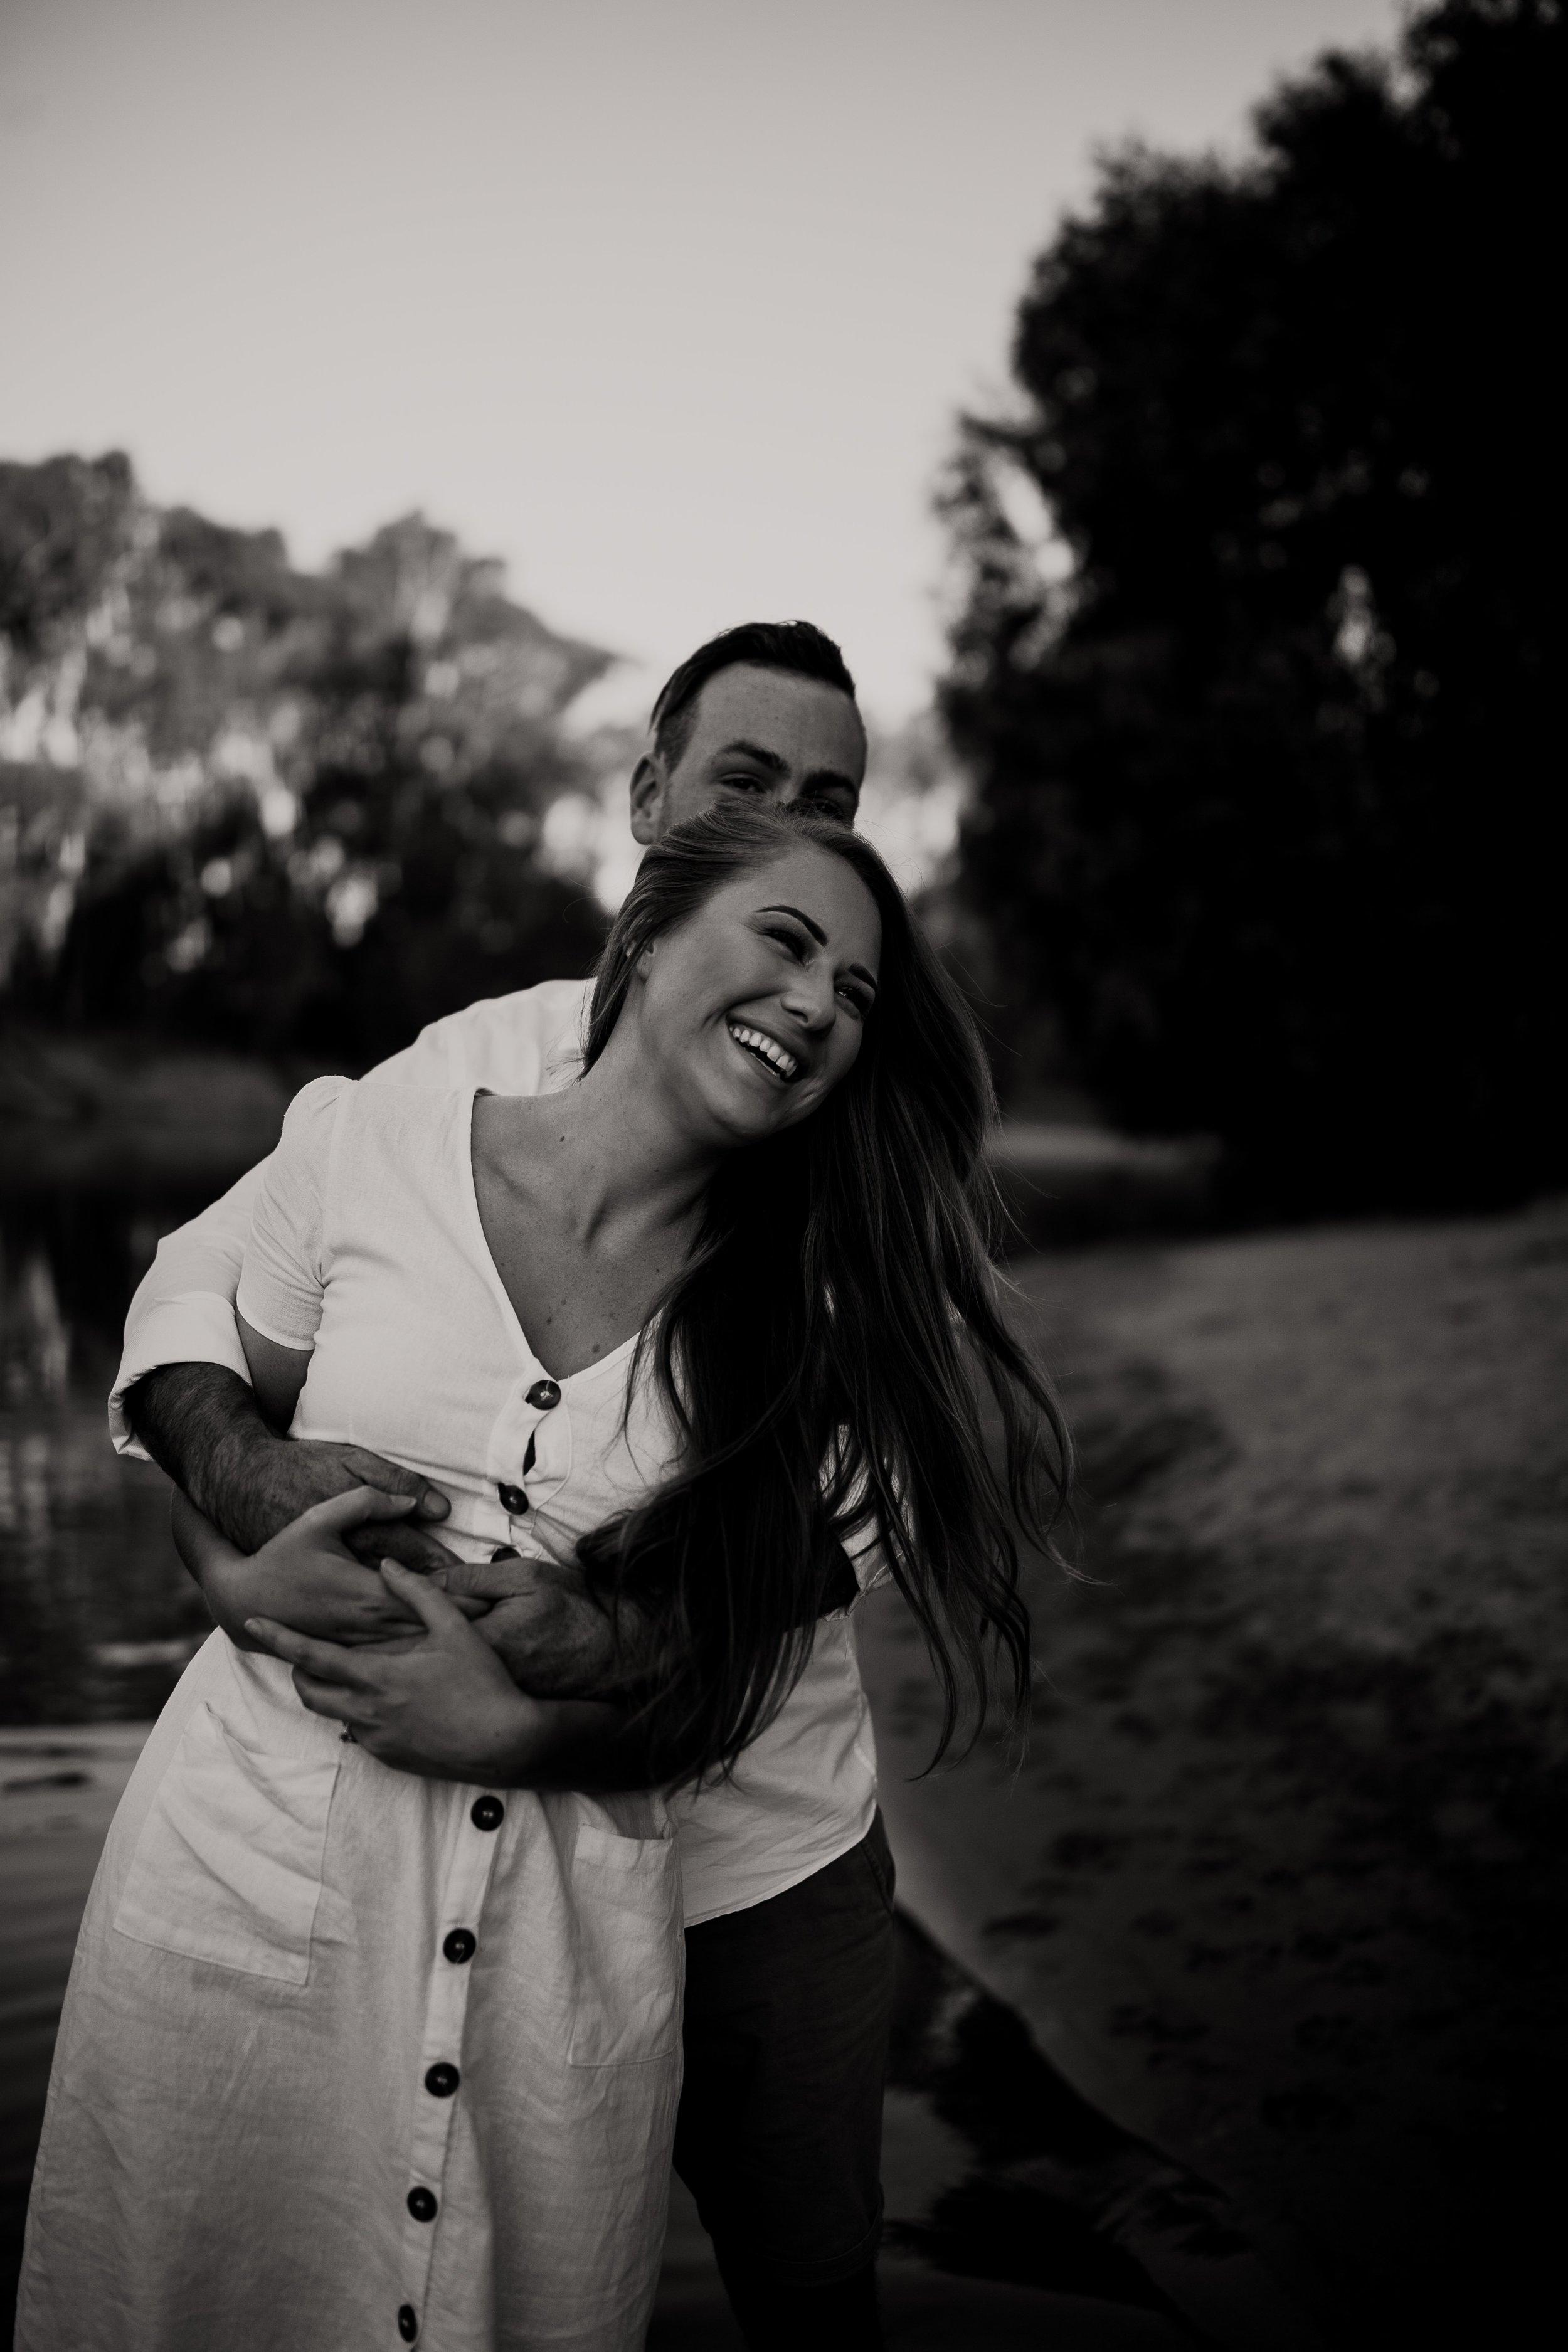 mickalathomas_puremacphotography_weddingphotographer_couplephotographer_Sheppartonphotographer_2844.jpg